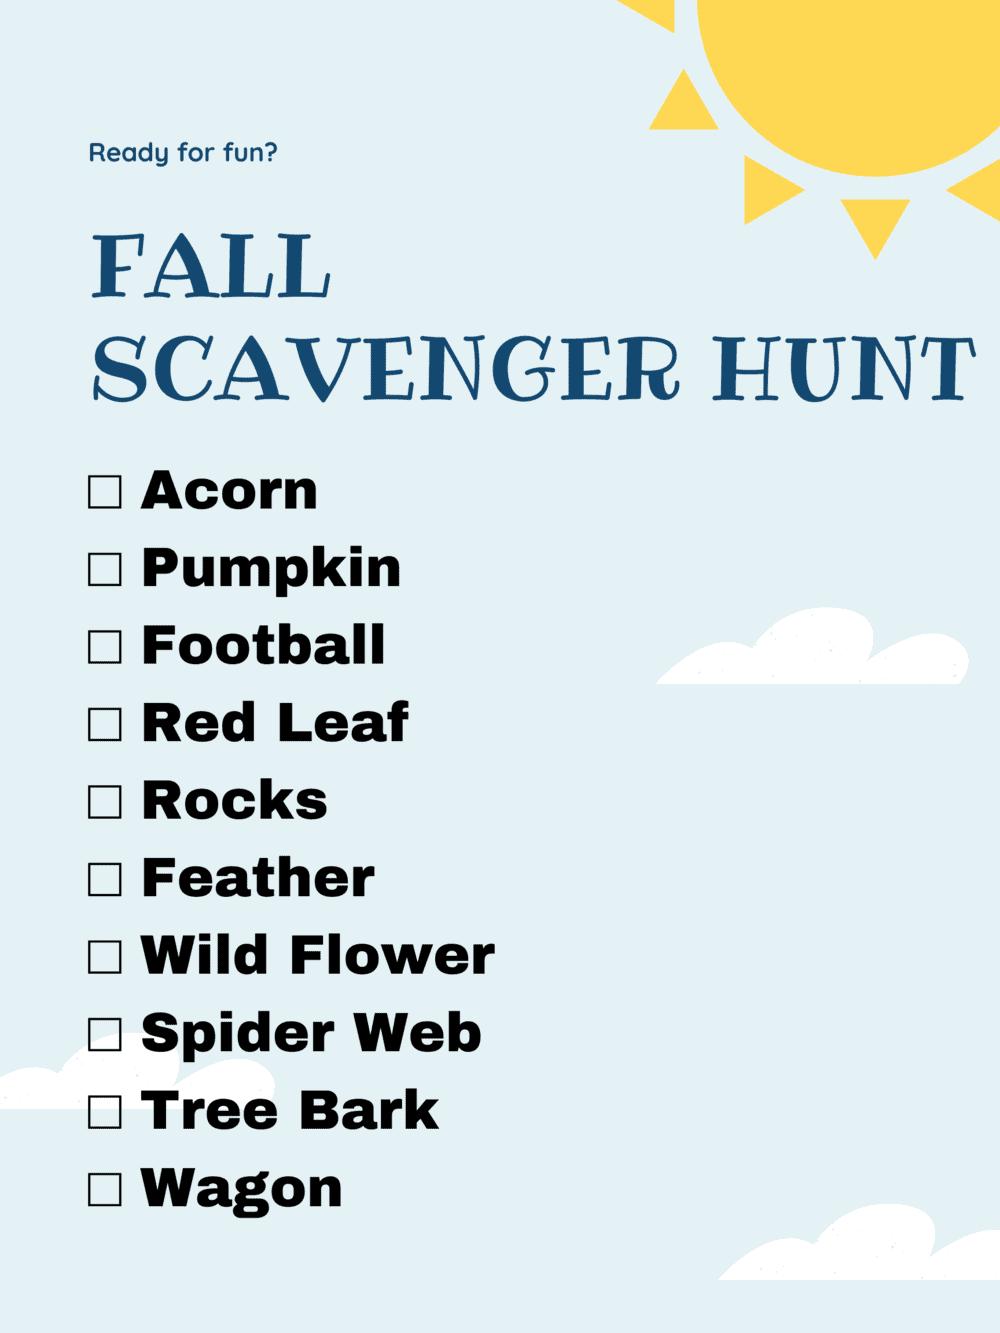 Fall Scavenger Hunt list